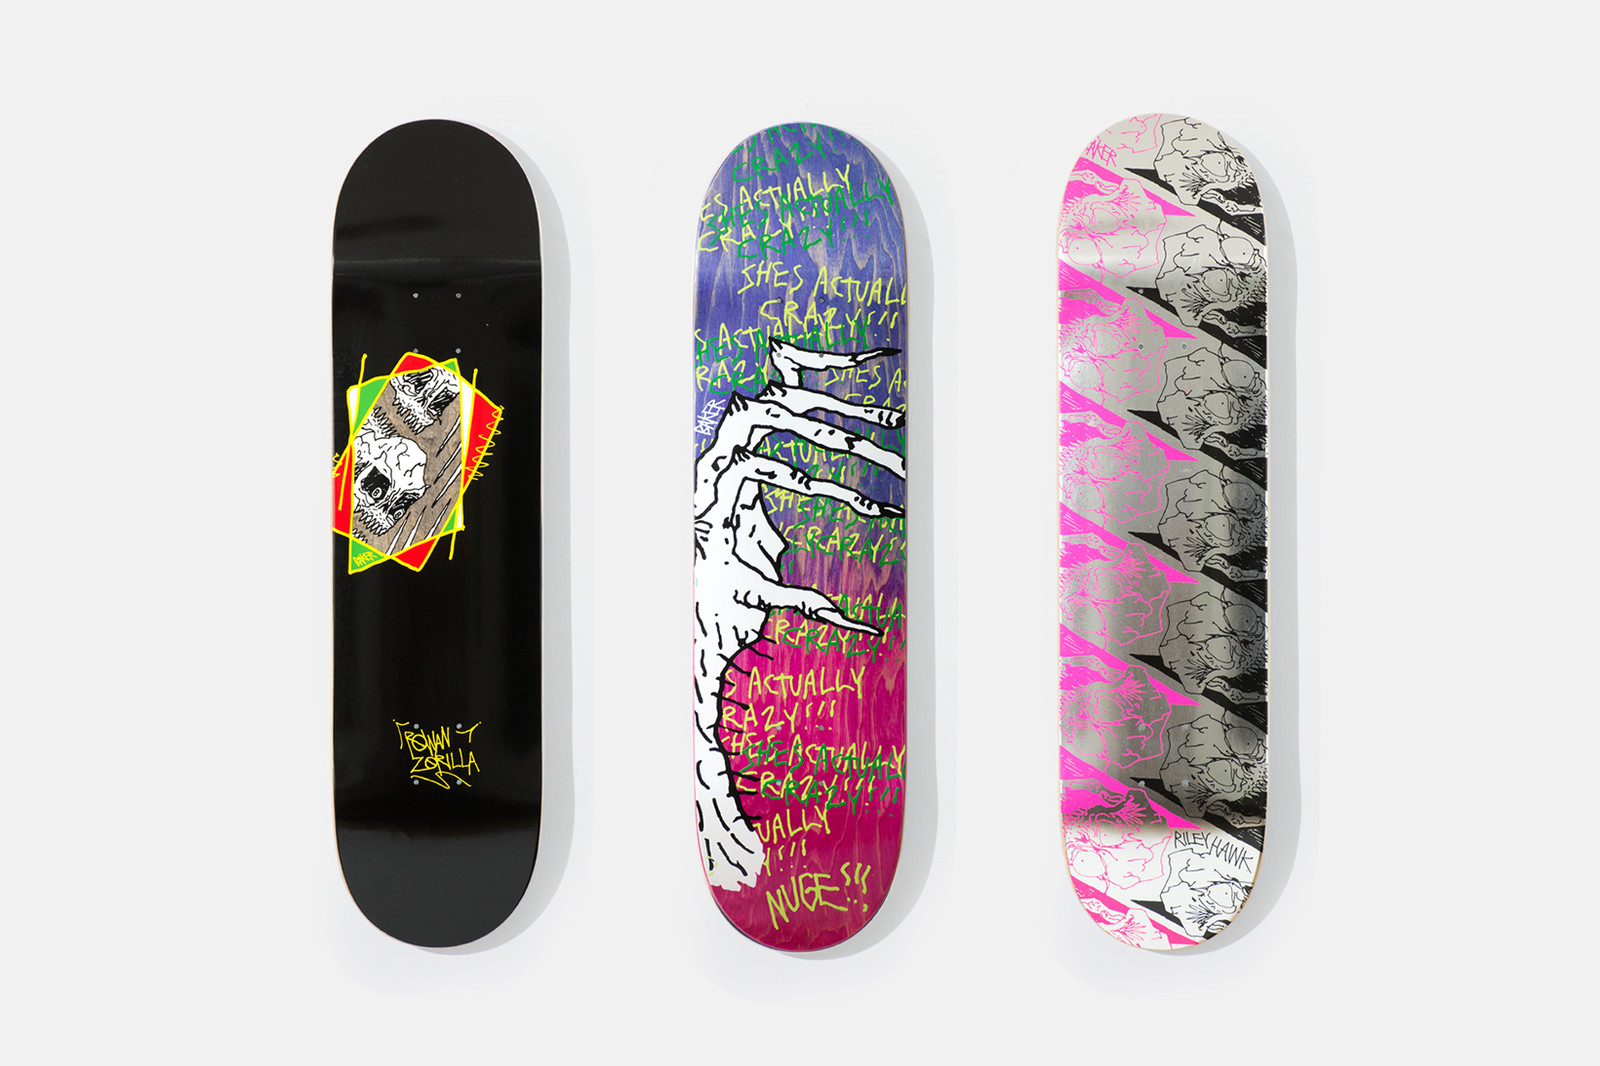 Serdar Bilgili Ai Weiwei Daniel Arsham GucciGhost Neckface Baker Skateboards Artwork Photography Exhibit Installation